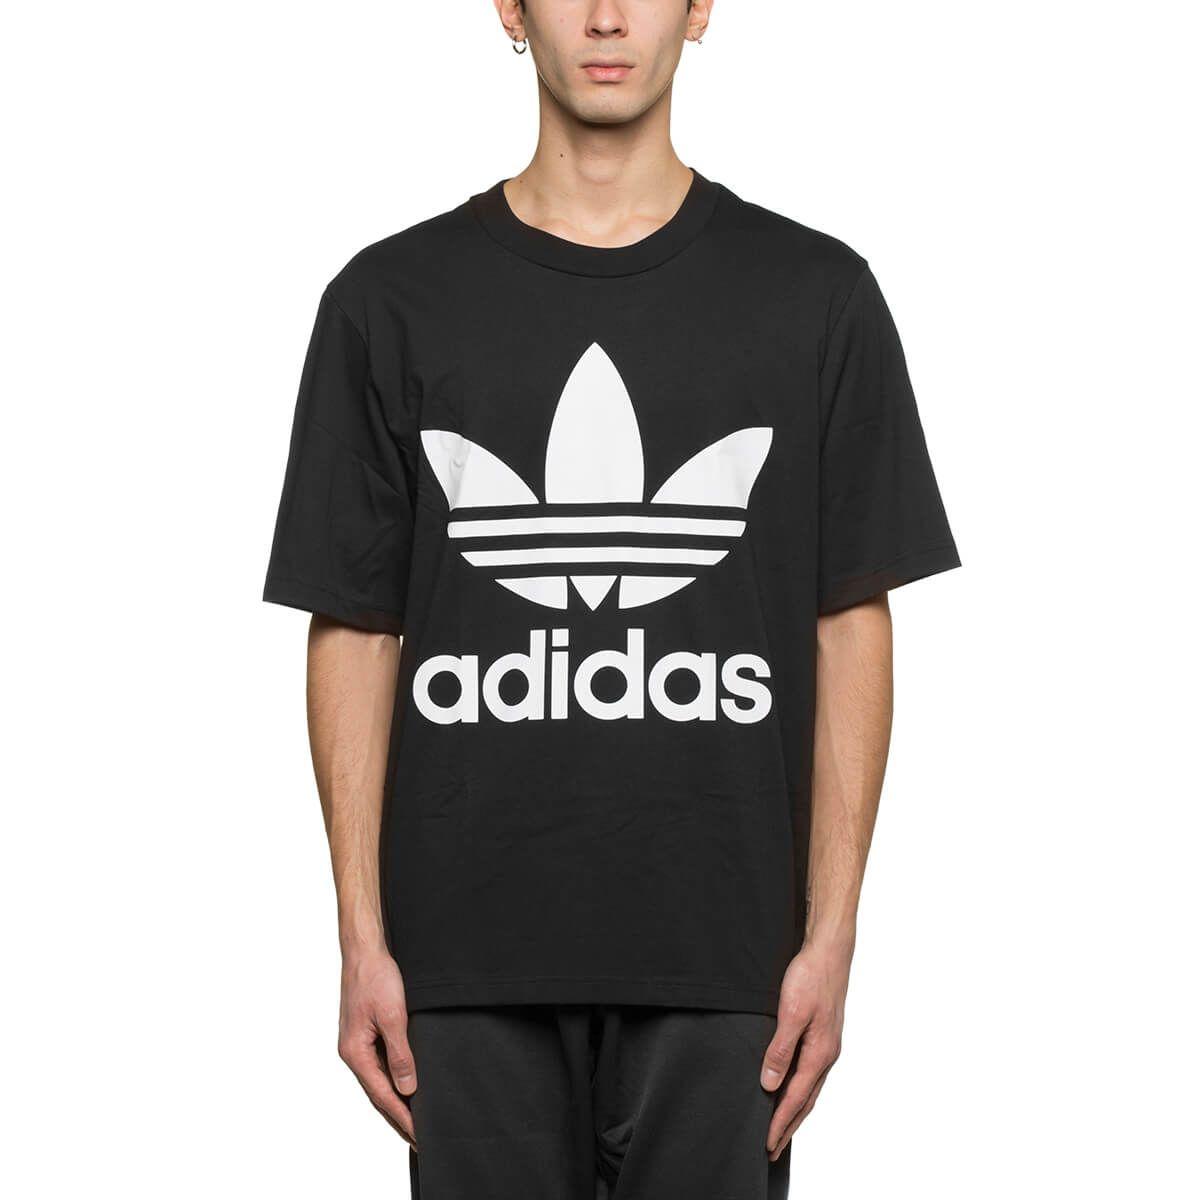 Adidas Originals Boxy T-shirt